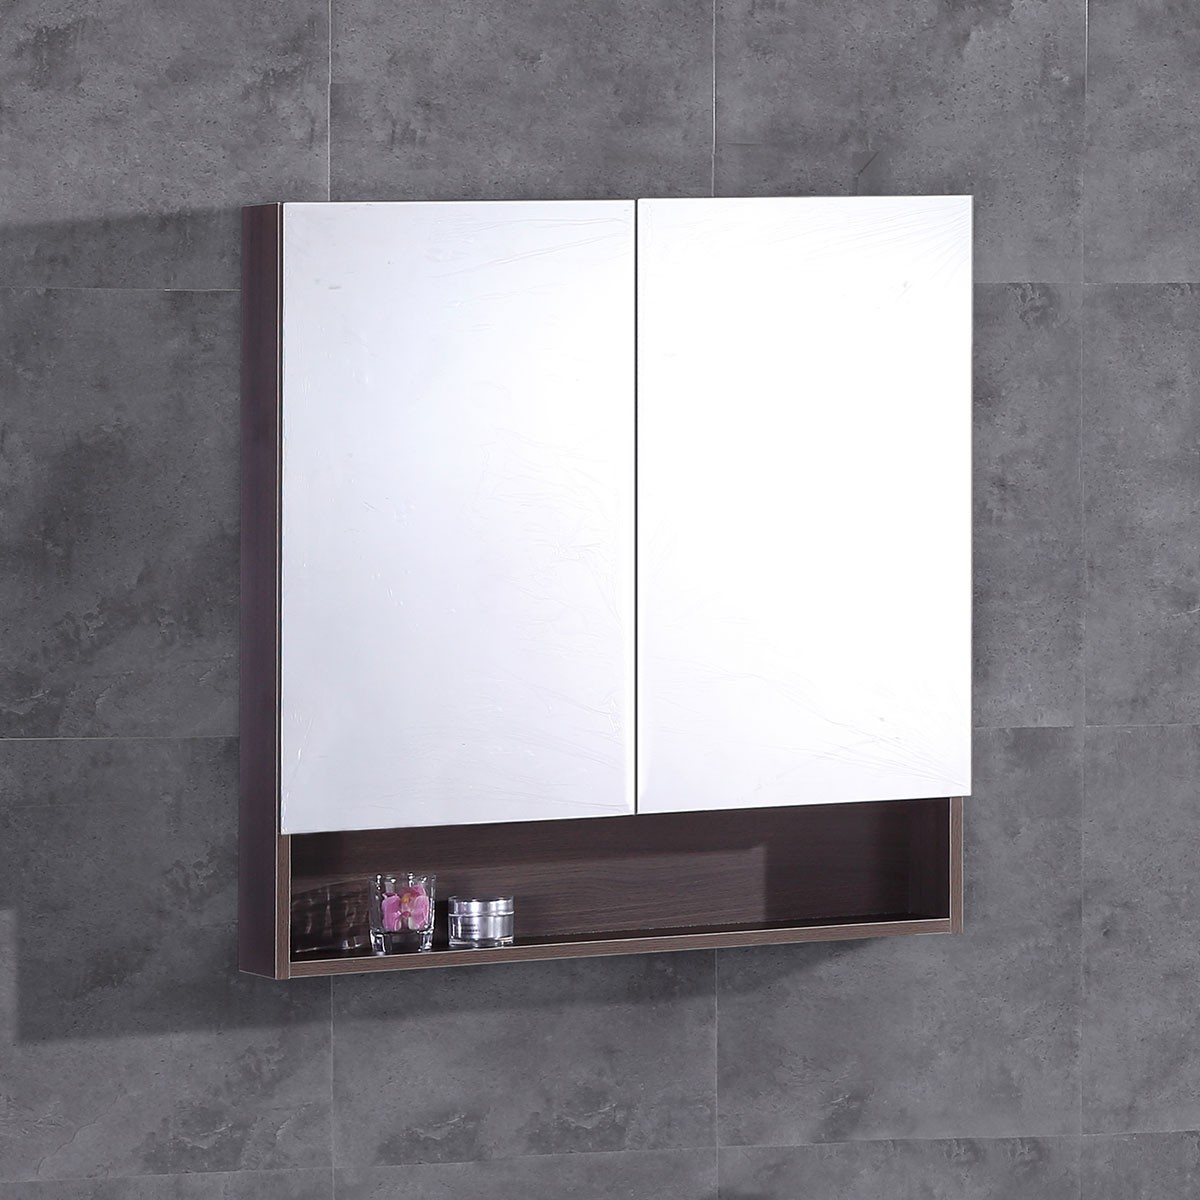 32 x 32 In. Mirror Cabinet (DK-T5007-M)